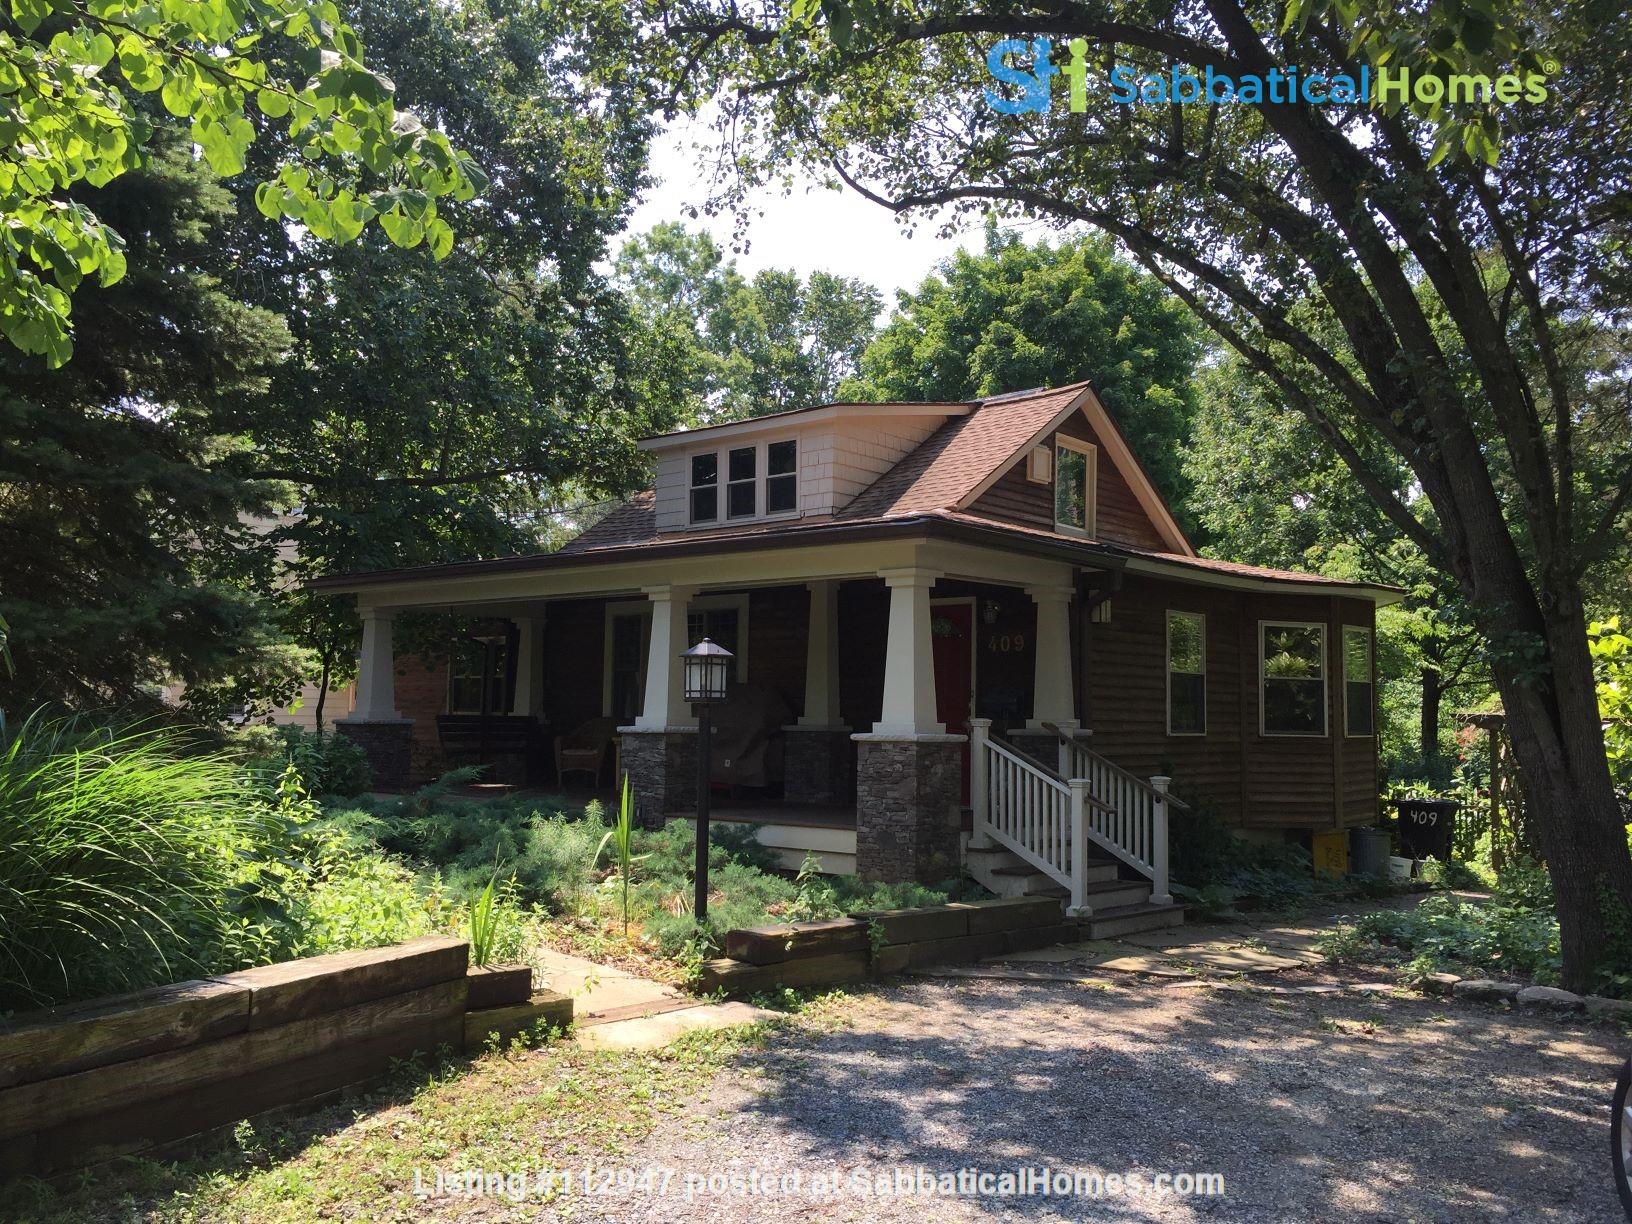 Summer 2021 Rental in Takoma Park, MD Home Rental in Takoma Park, Maryland, United States 0